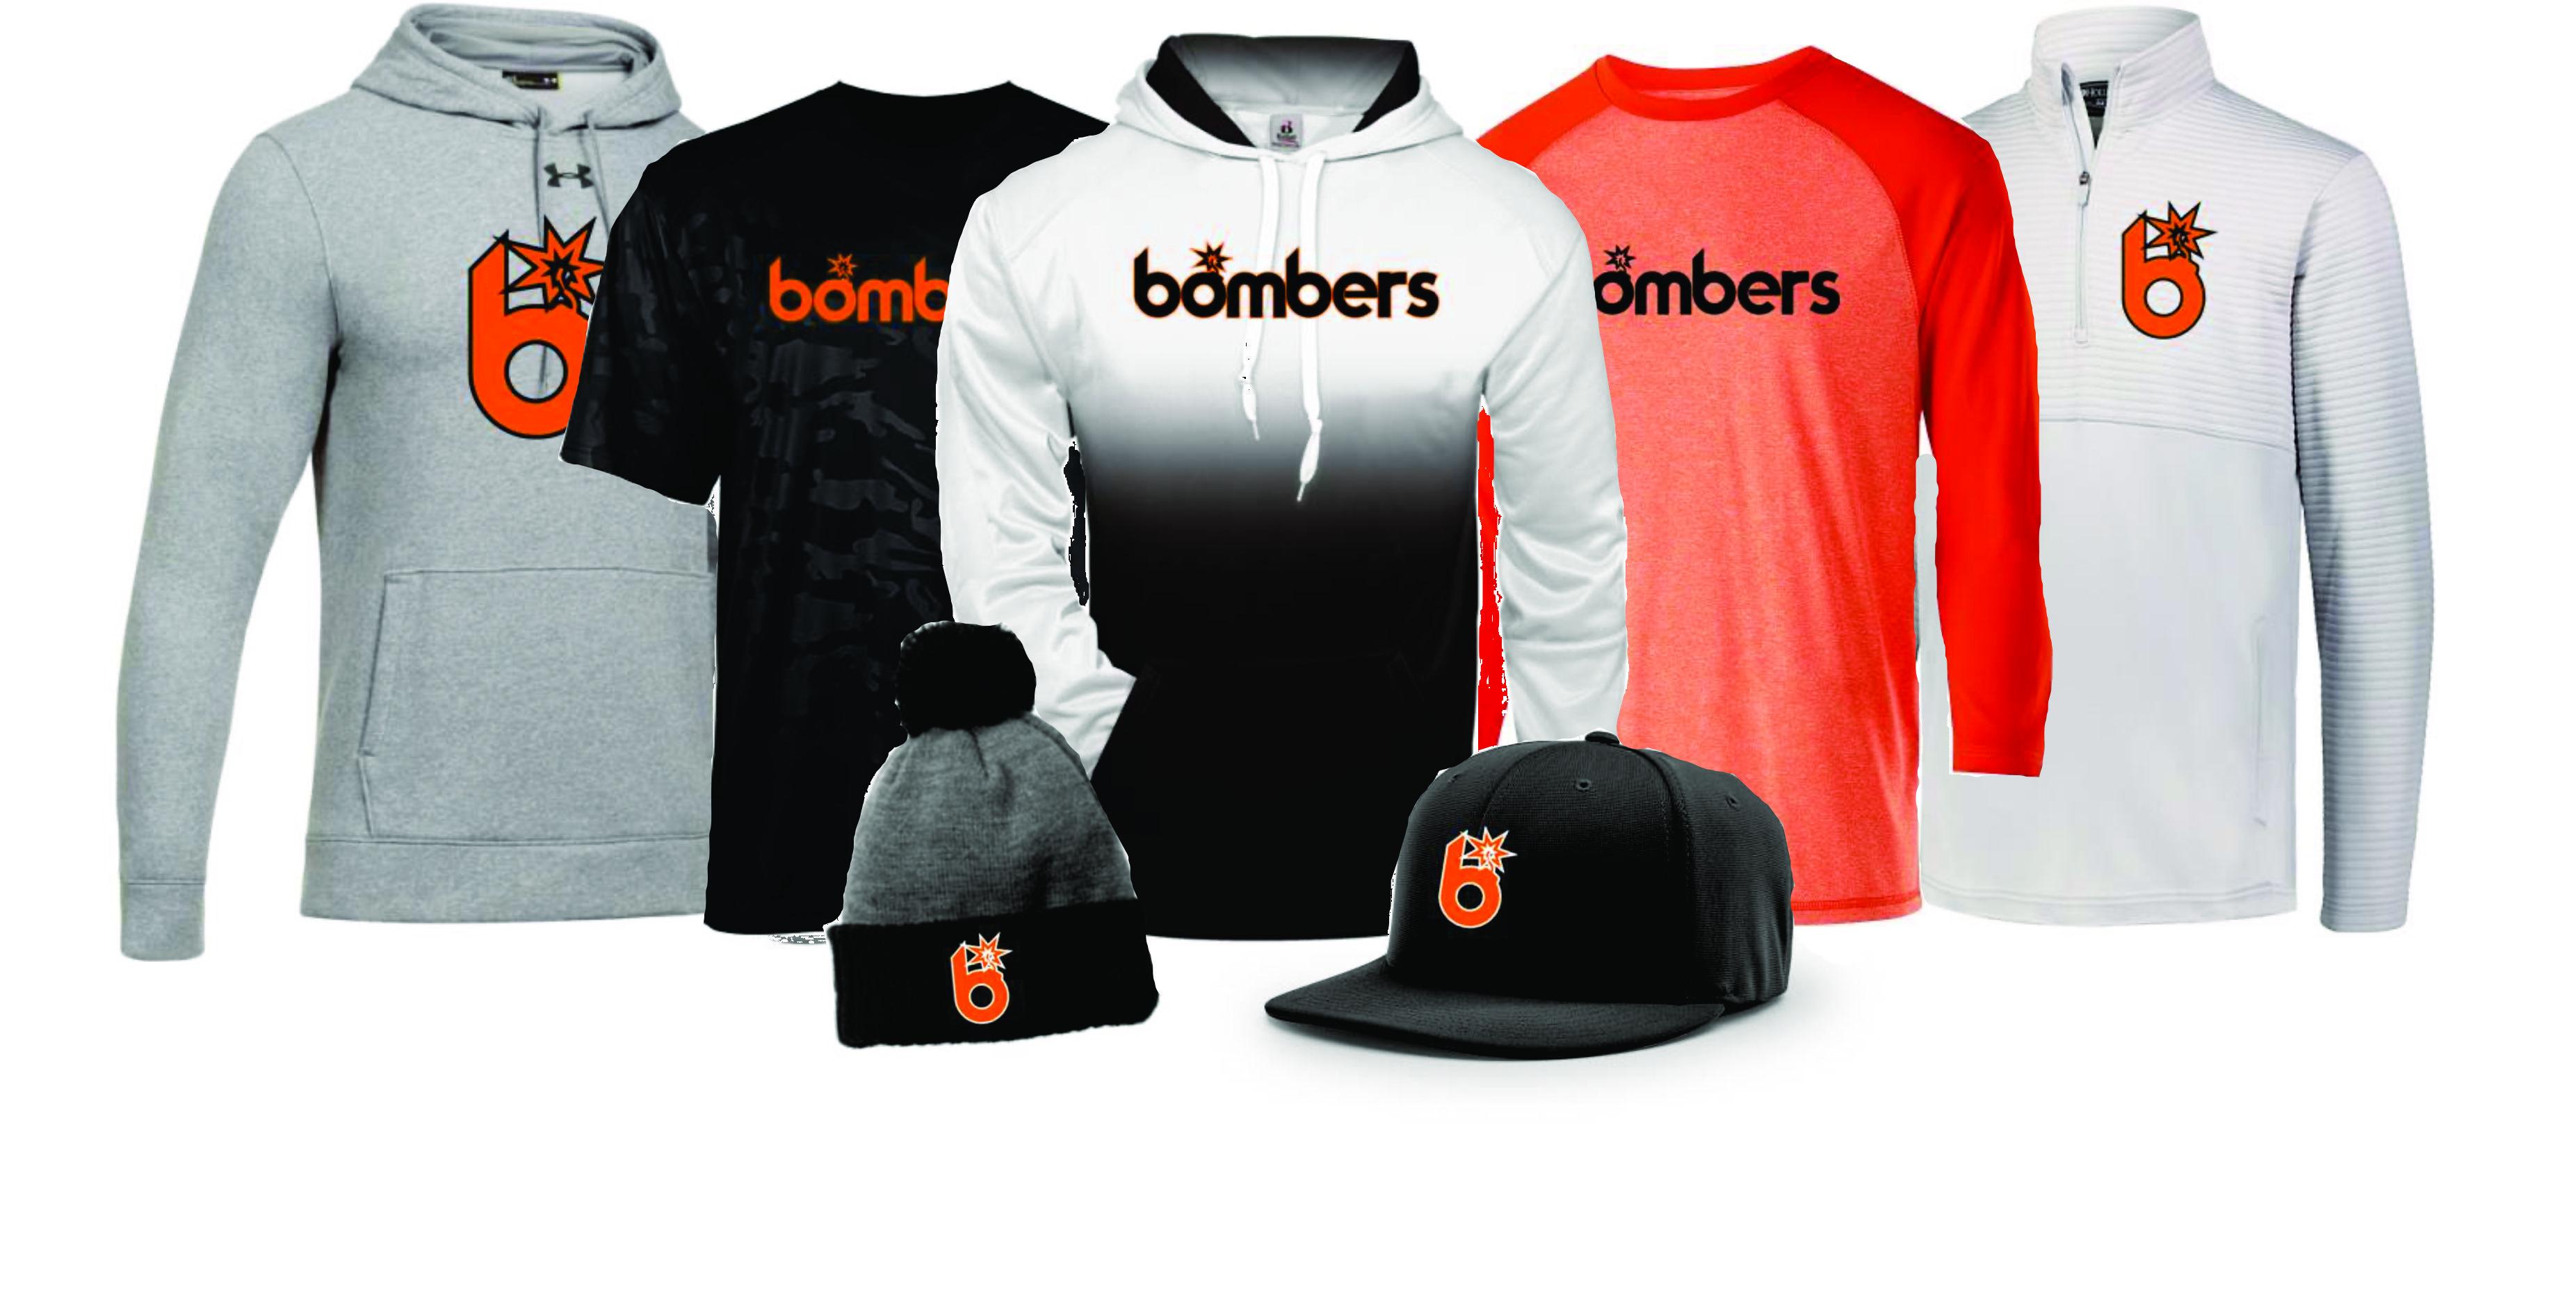 bombers-order-now.jpg